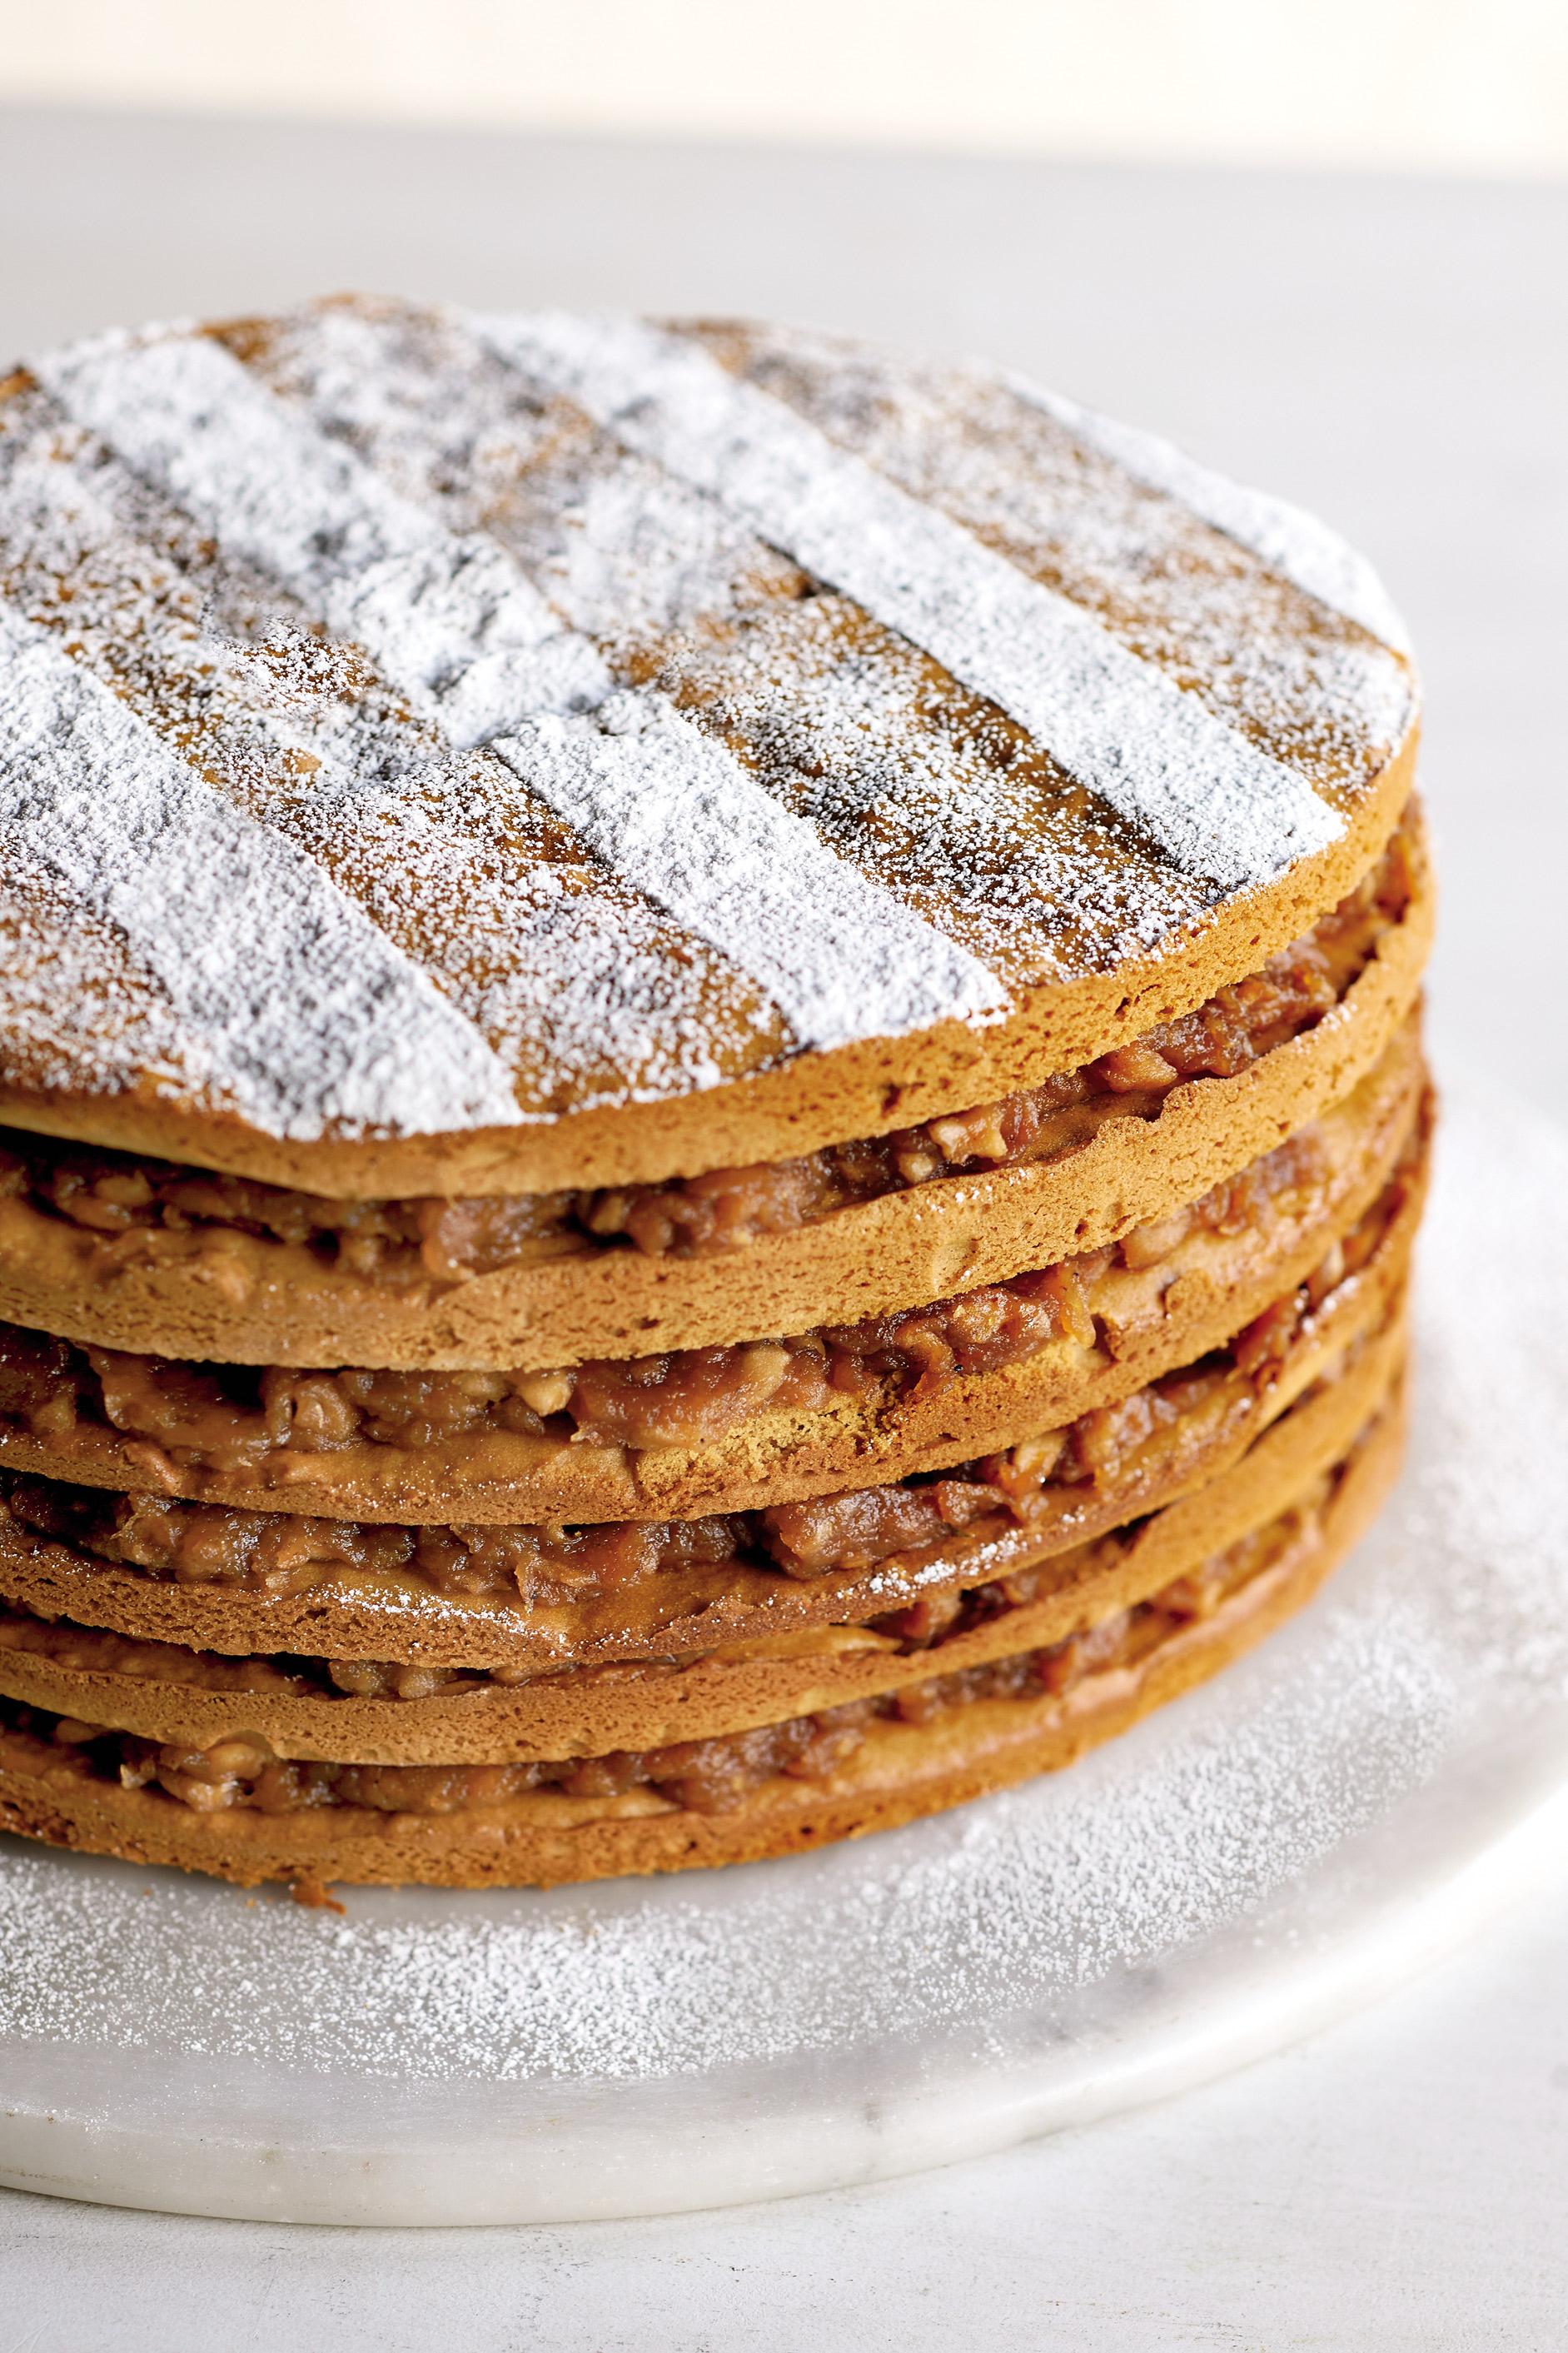 anne byrn cake apple stack